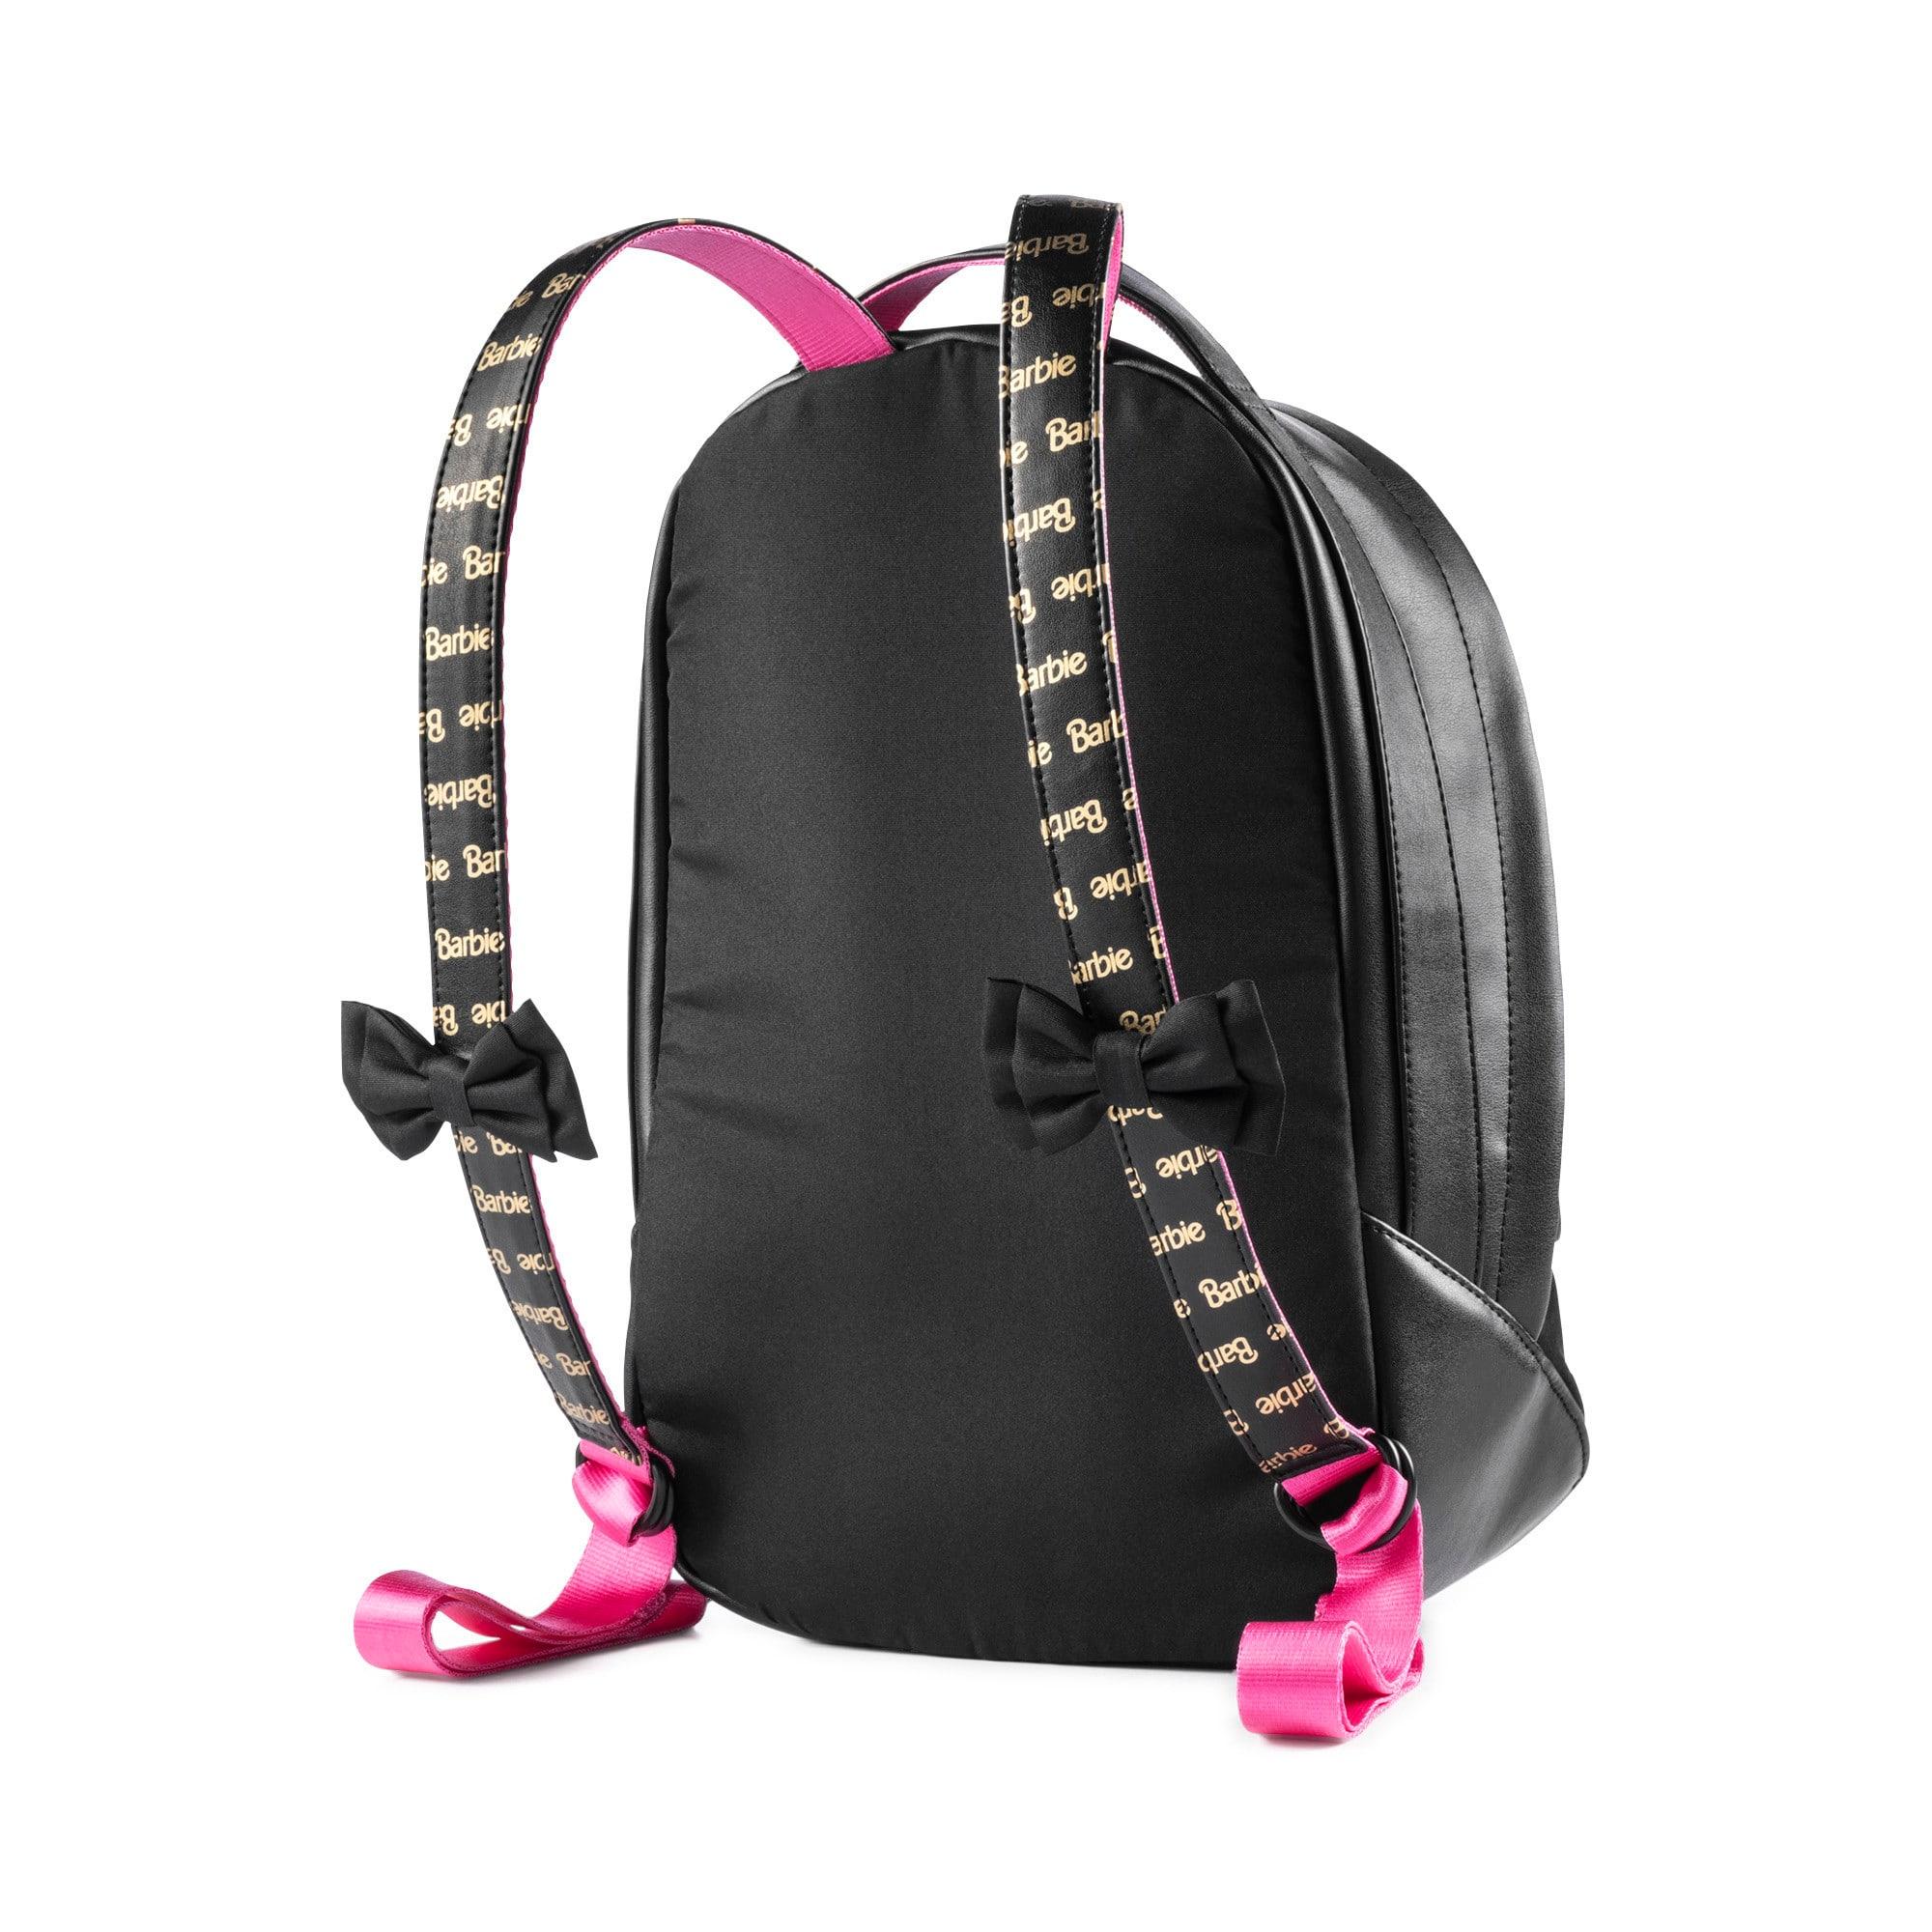 Thumbnail 2 of PUMA x BARBIE Backpack, Puma Black, medium